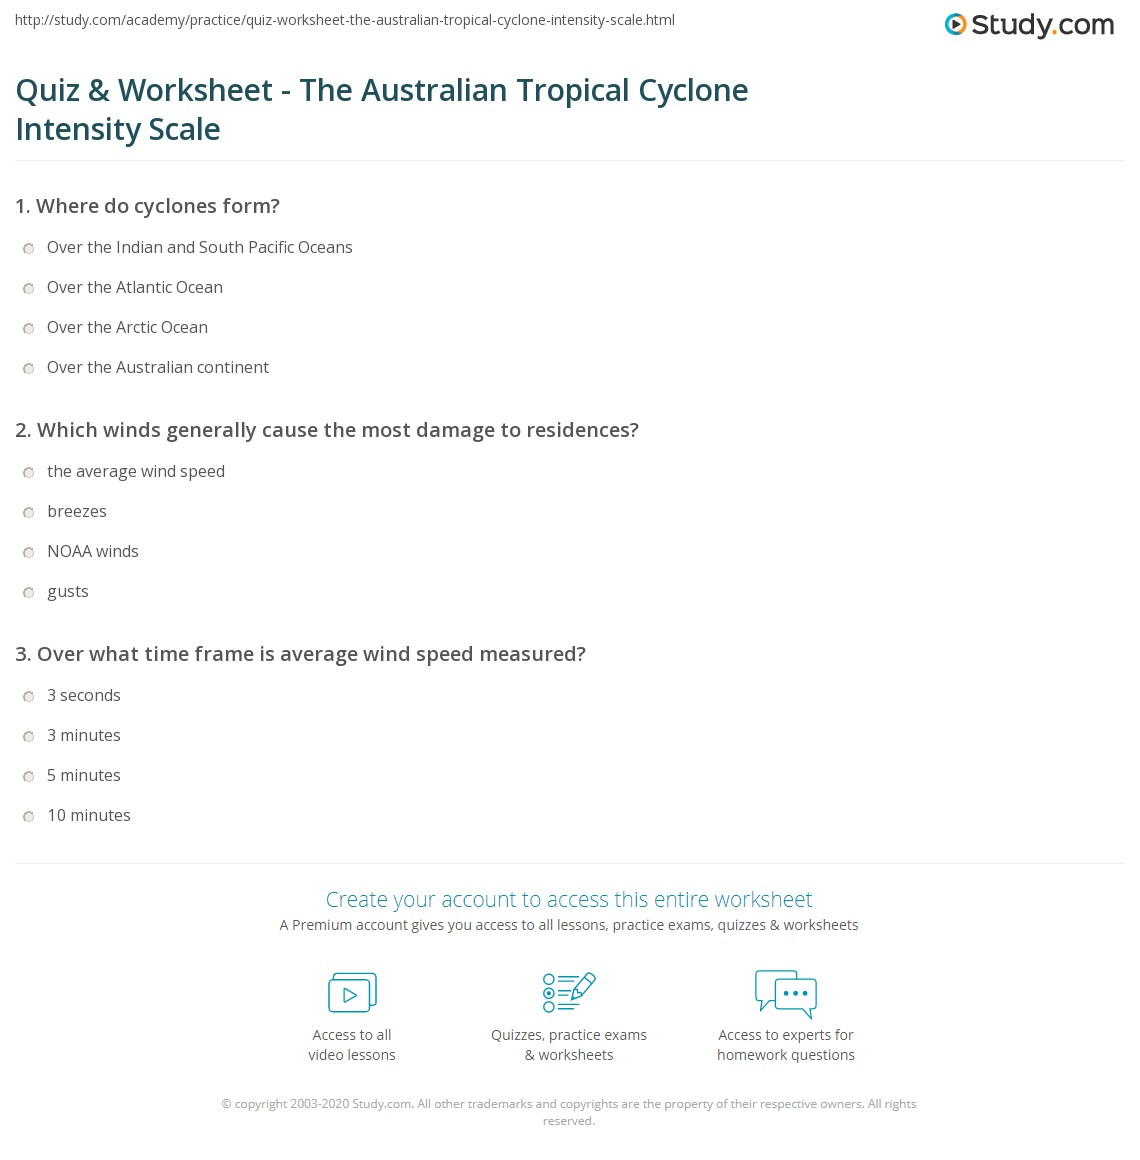 Quiz W Ksheet Ustr Li N Tropic L Cycl E Tensity Sc Le